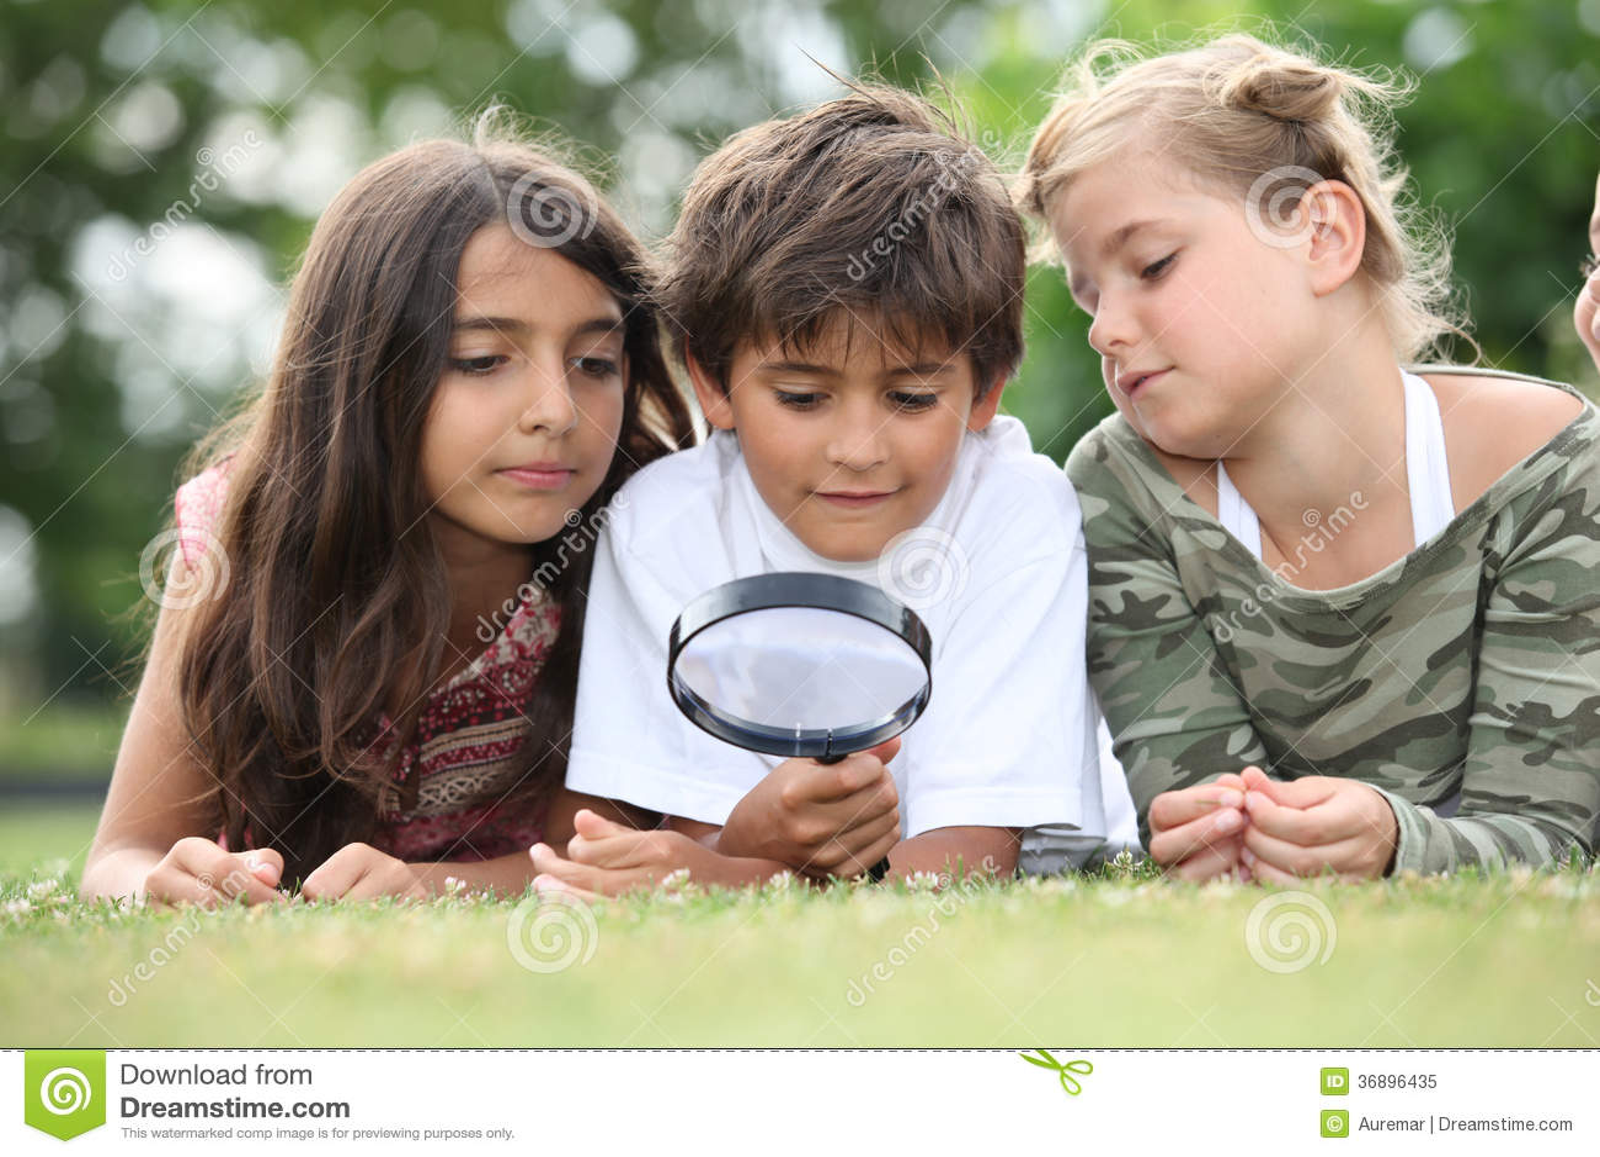 Enfants regardant des insectes